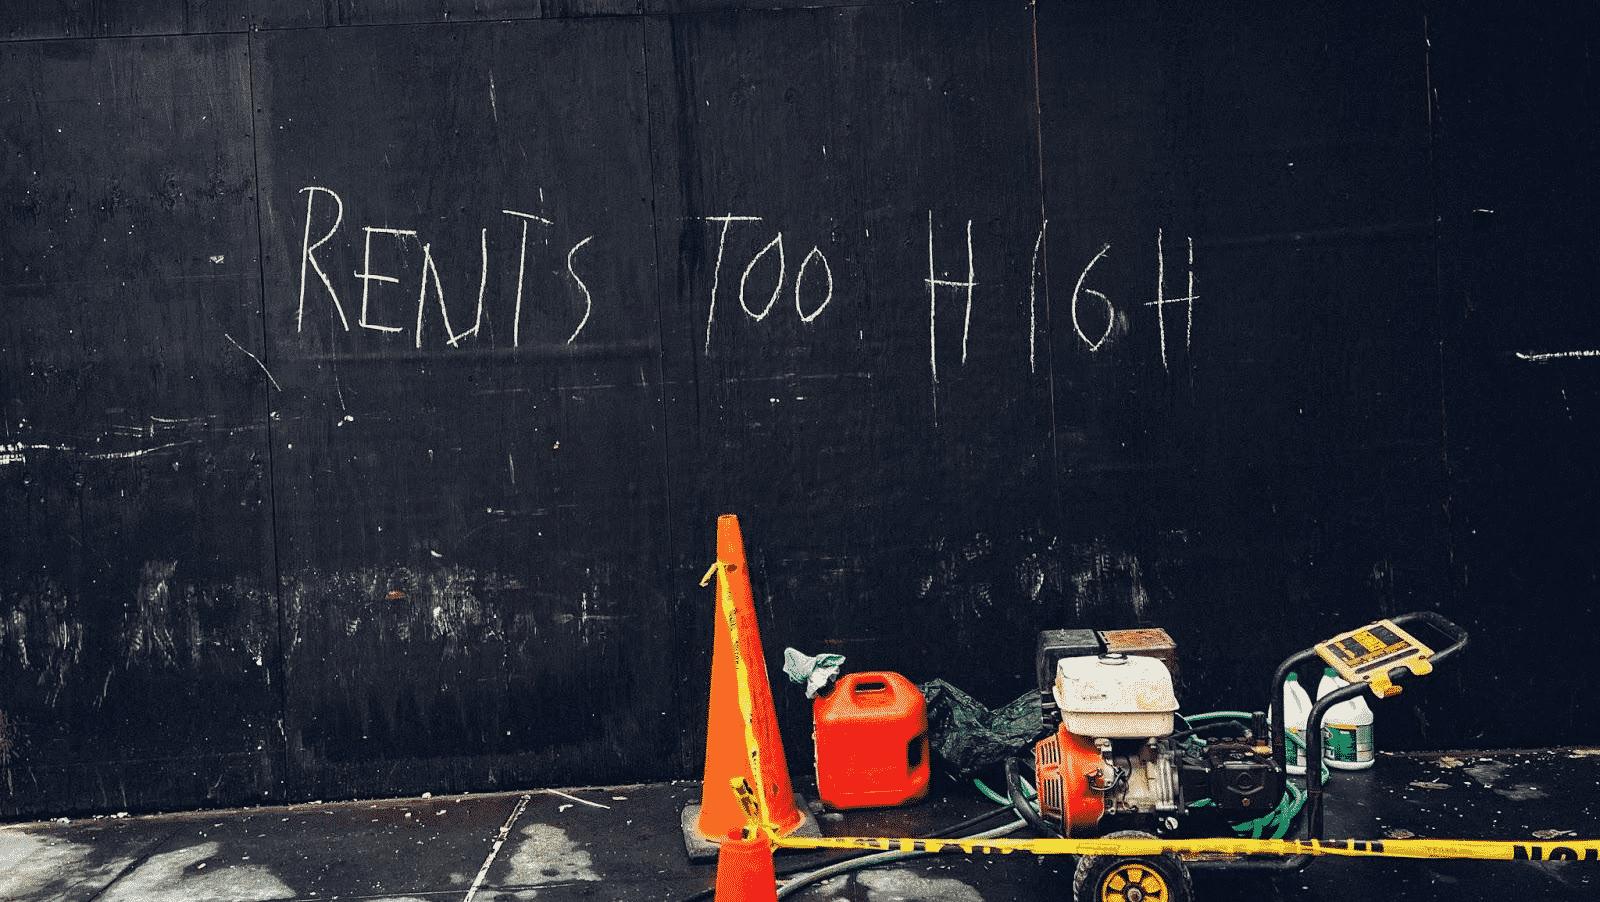 Rents too High